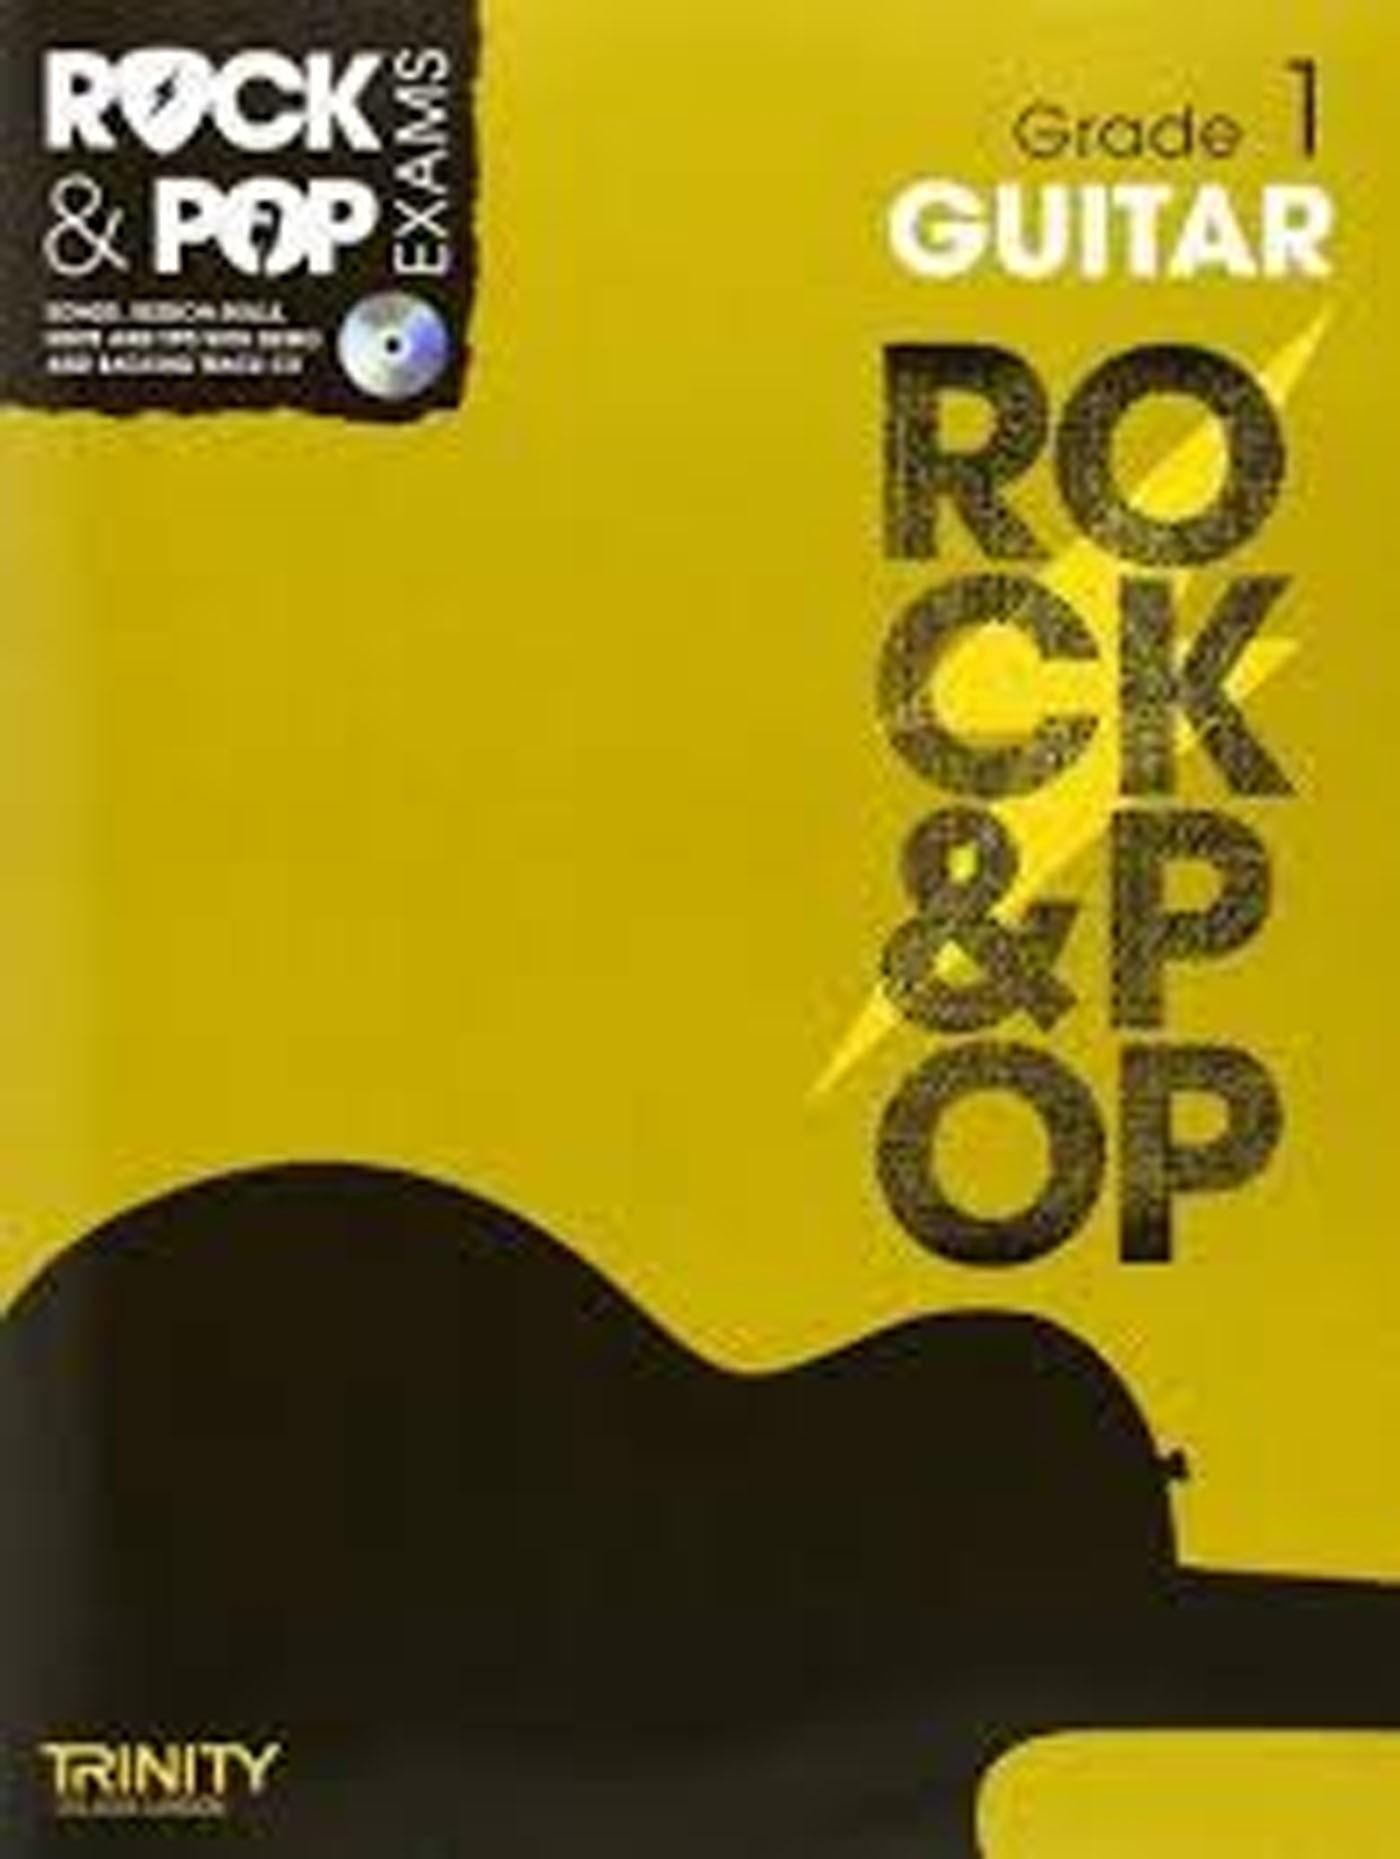 Rock & Pop Exams Guitar Grade 1 Book & CD Trinity College London S147